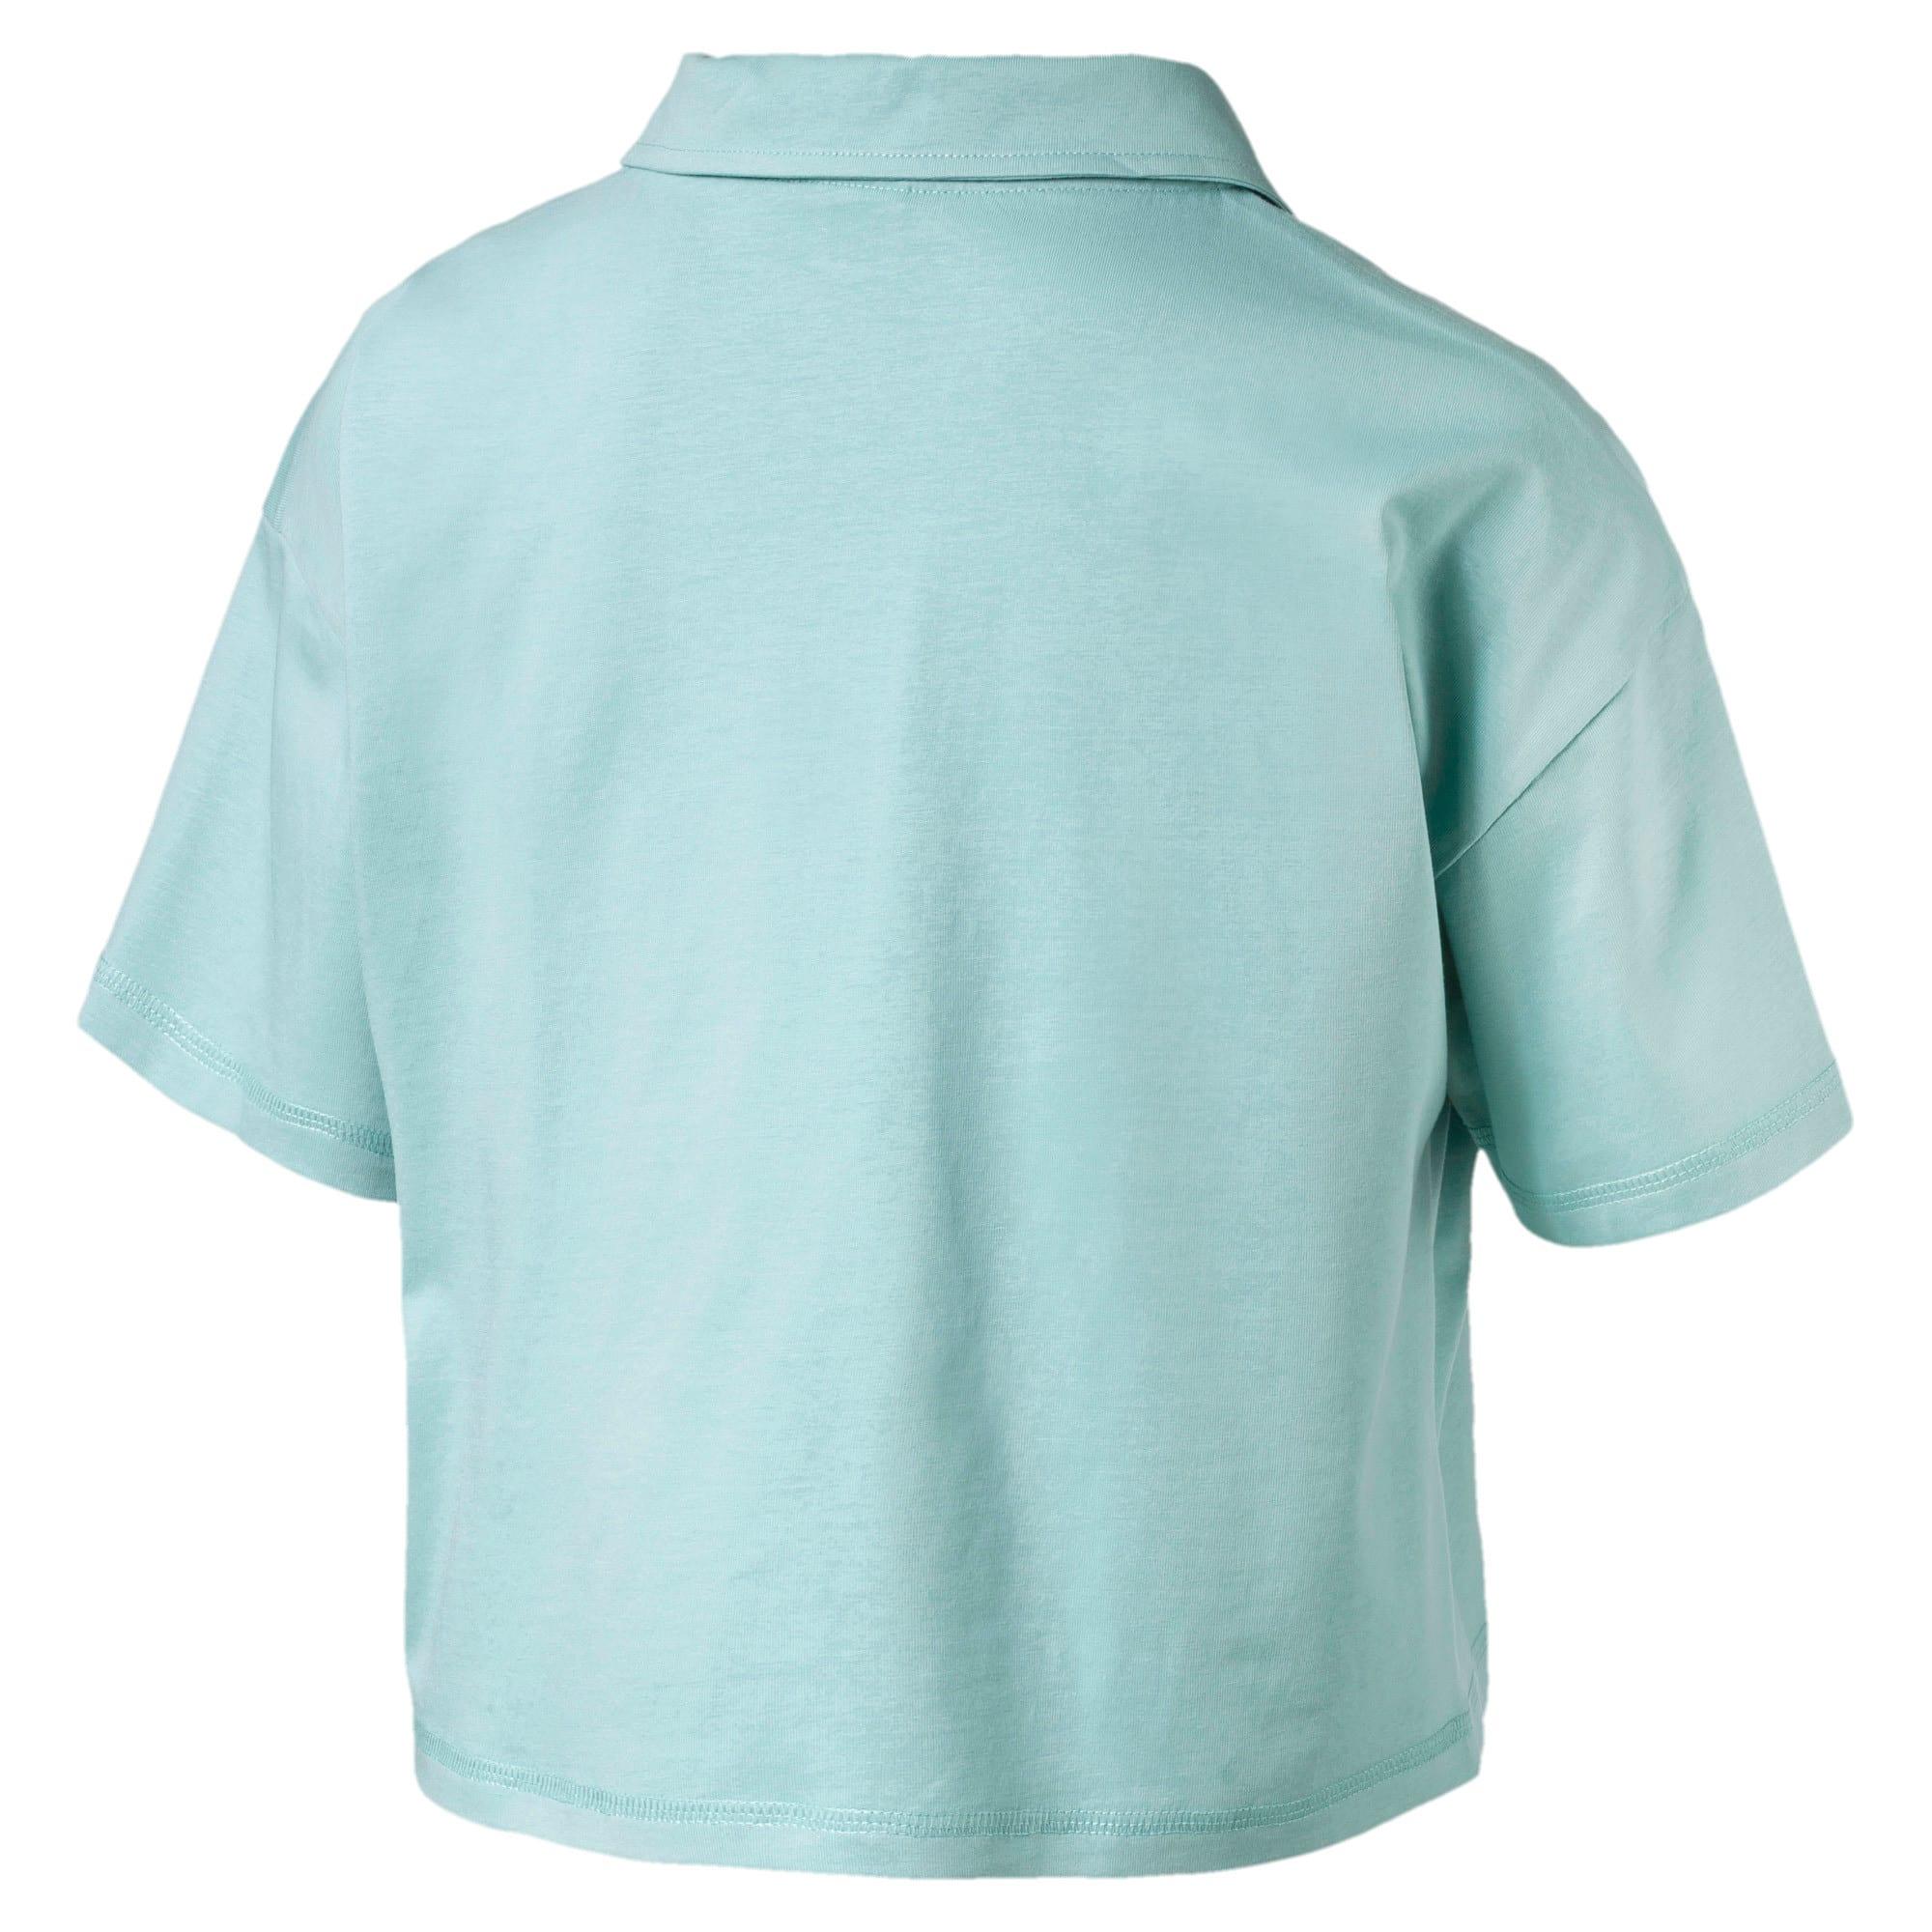 Thumbnail 4 of Downtown Women's Polo Shirt, Aquifer, medium-IND